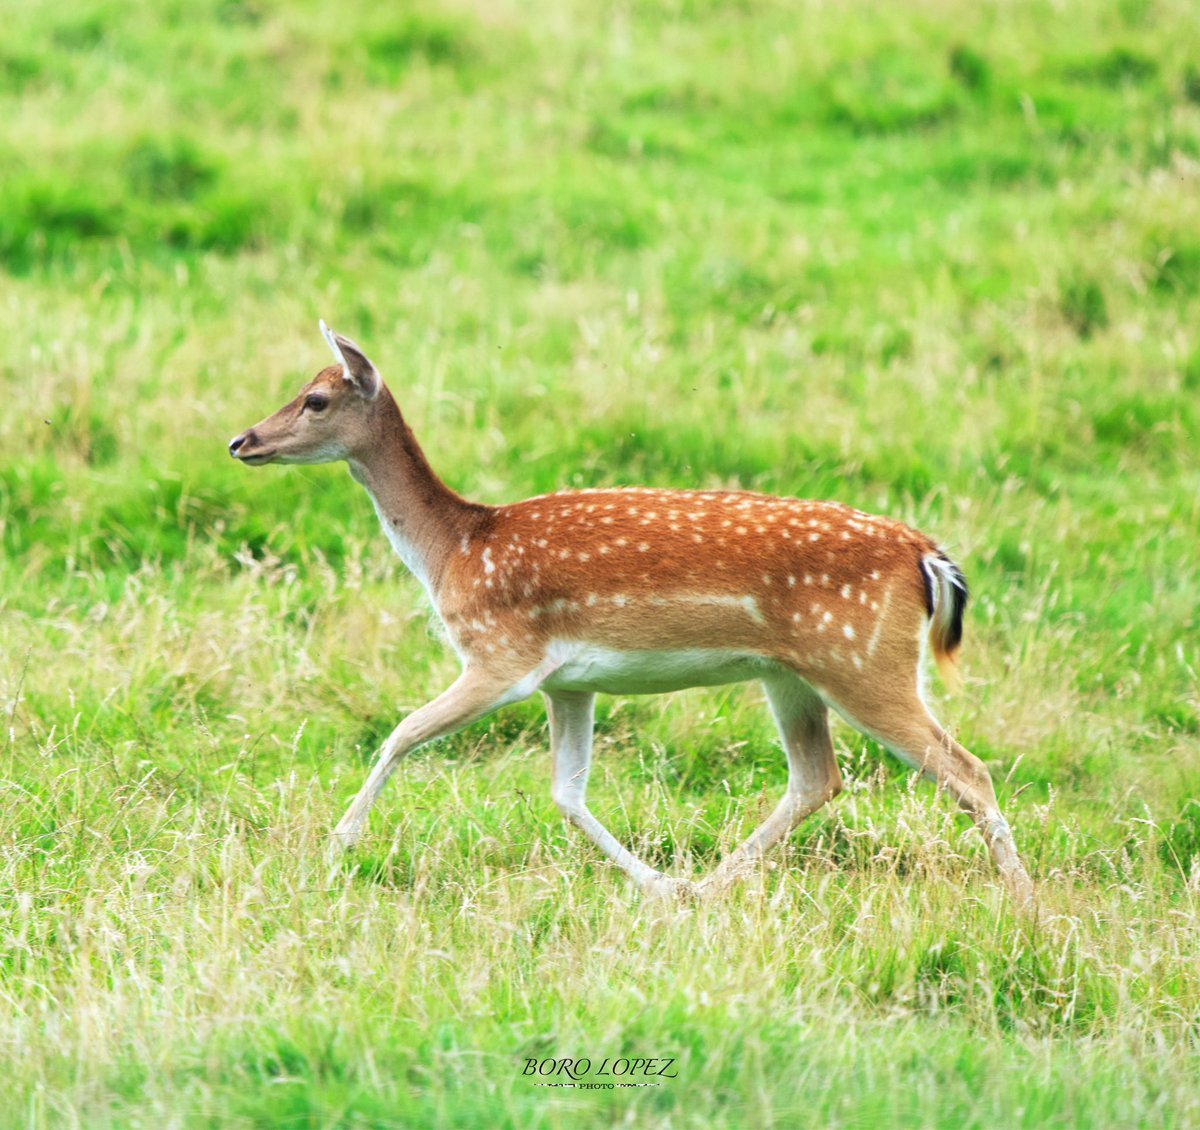 Scottish young deers. Hopetoun, Scotland #scottish #fawns #deer #hopetoun #nature #wildlife #scotlandisnow #scotland #600mm #borolopezphoto #SonyAlpha #telephoto https://t.co/OVD2ZbuZEd